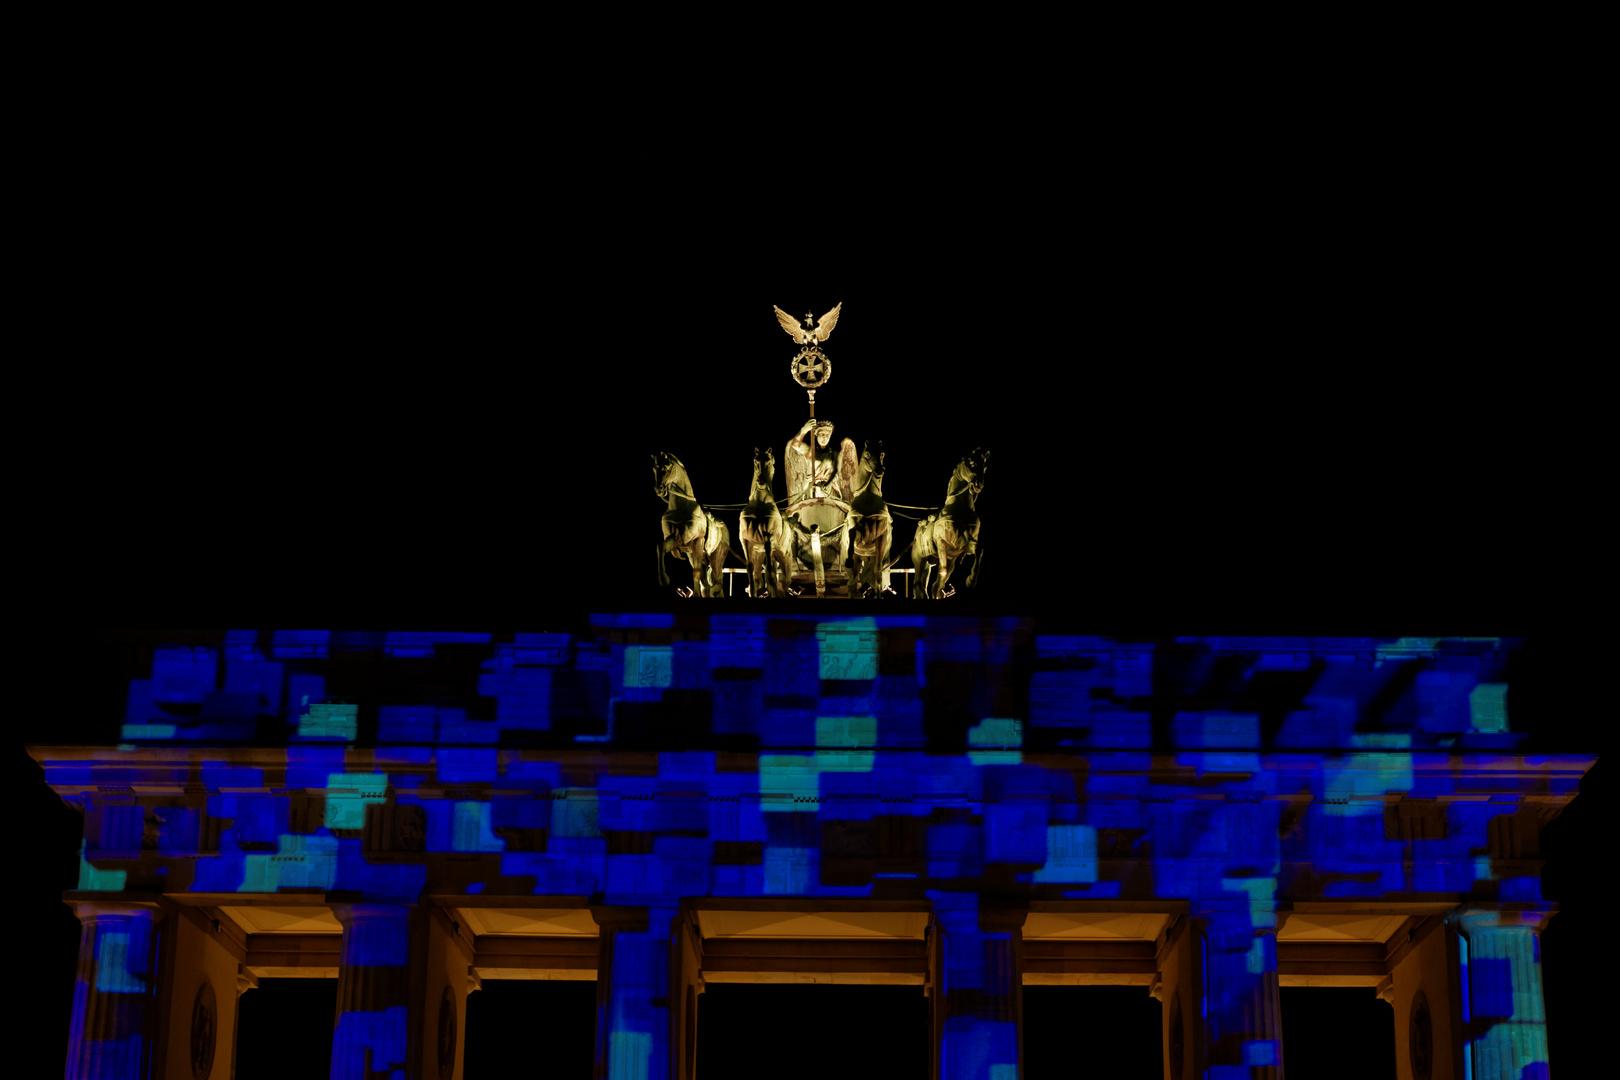 Berlin leuchtet 2014 - Quadriga/Brandenburger Tor